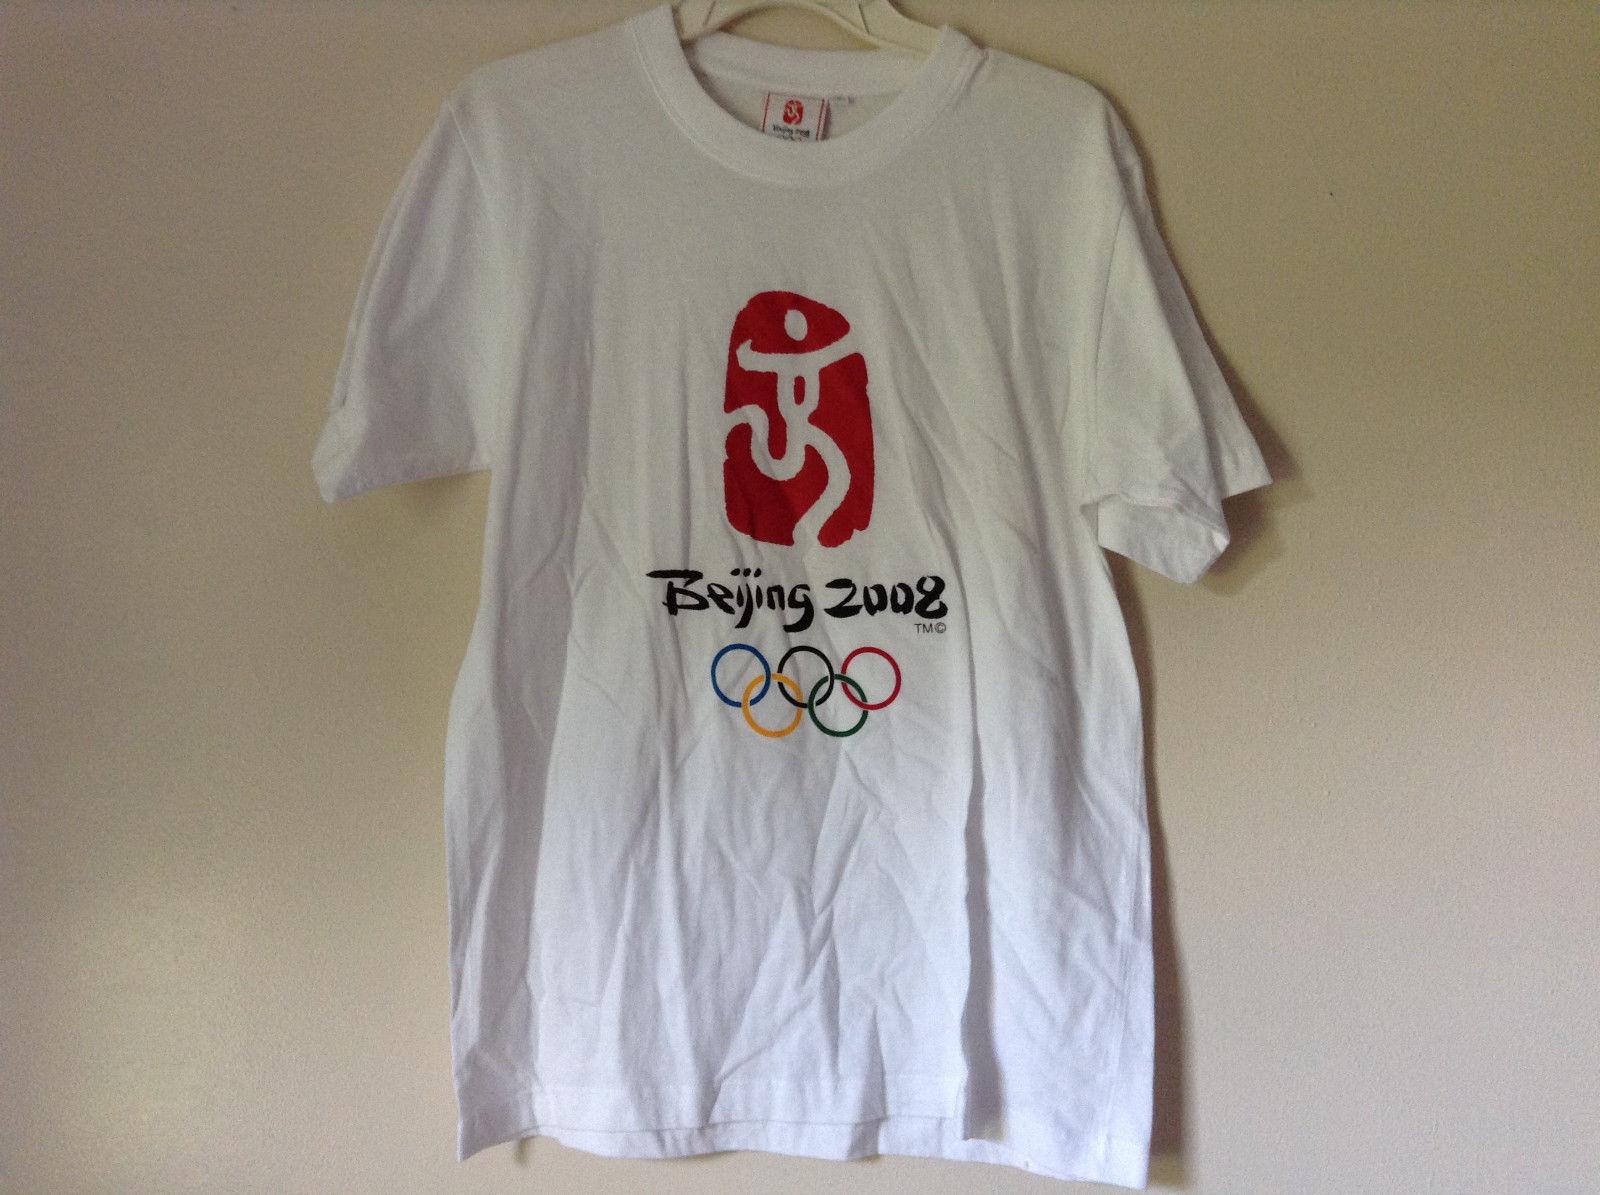 Olympics Beijing 2008 On Front White Short Sleeve T Short Plain Back Size Medium